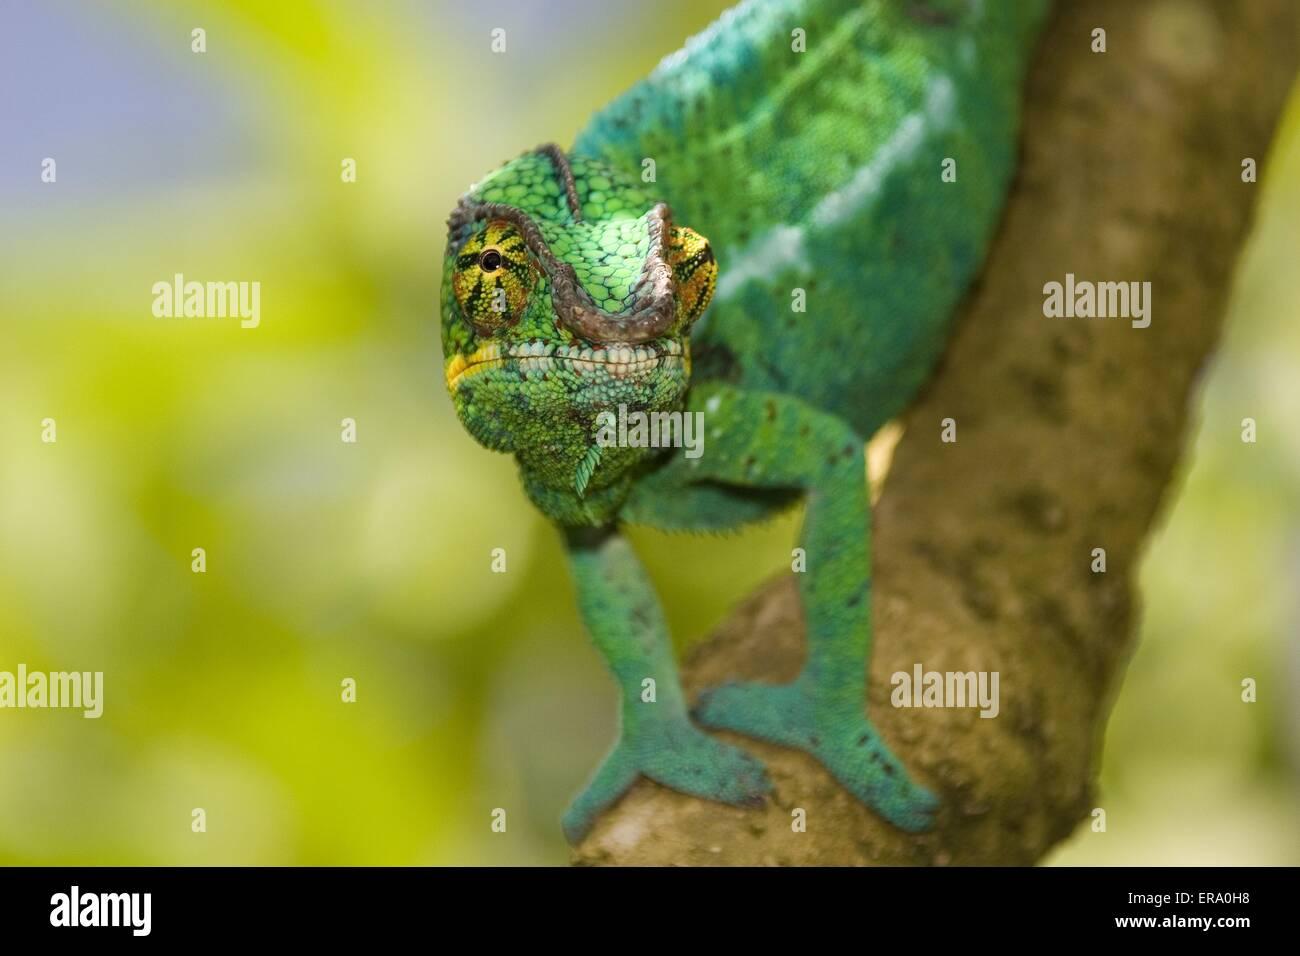 panther chameleon - Stock Image